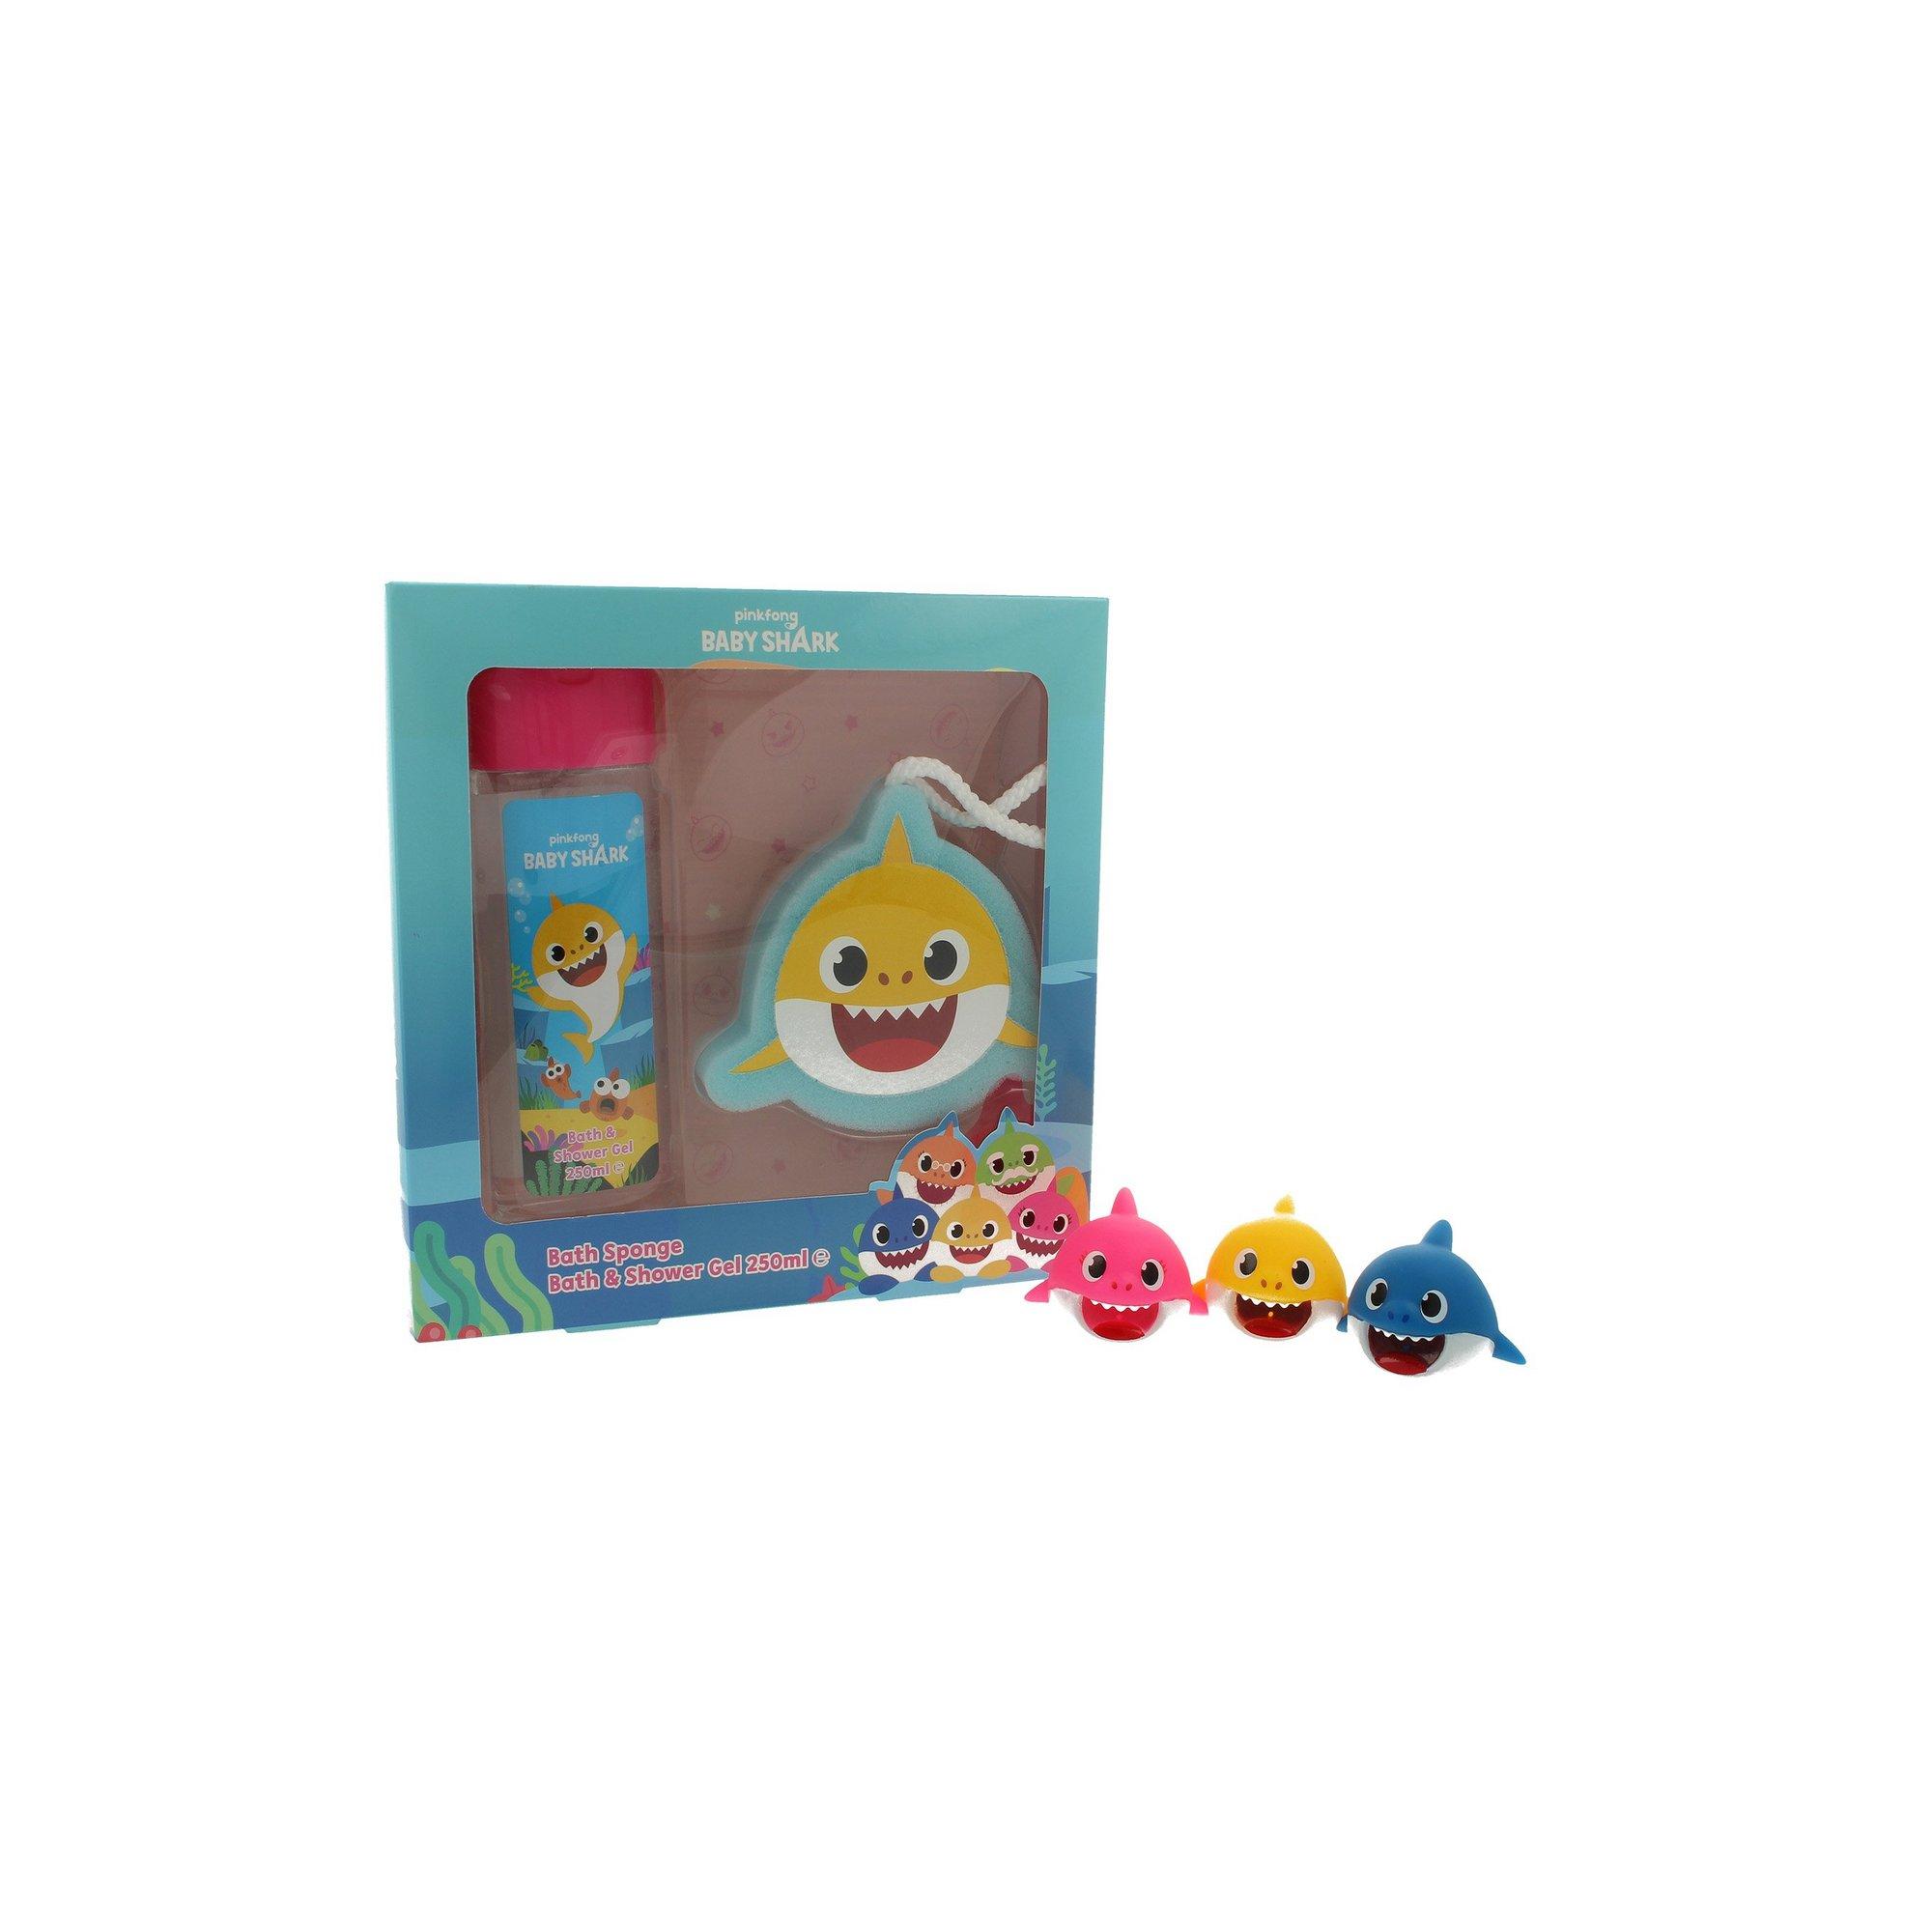 Image of Baby Shark Bubble Bath Play Set